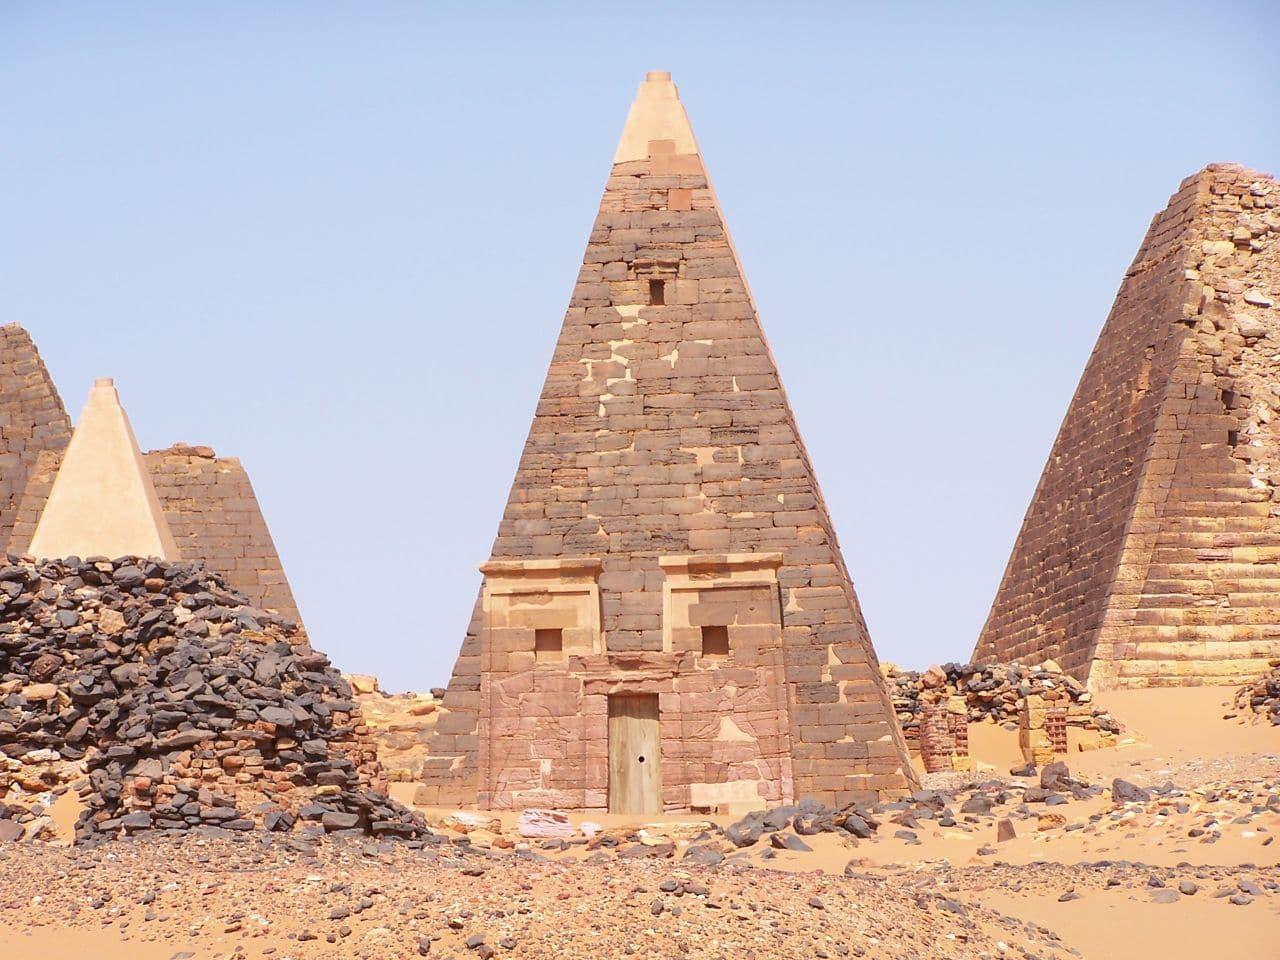 Pyramids of Northern Sudan